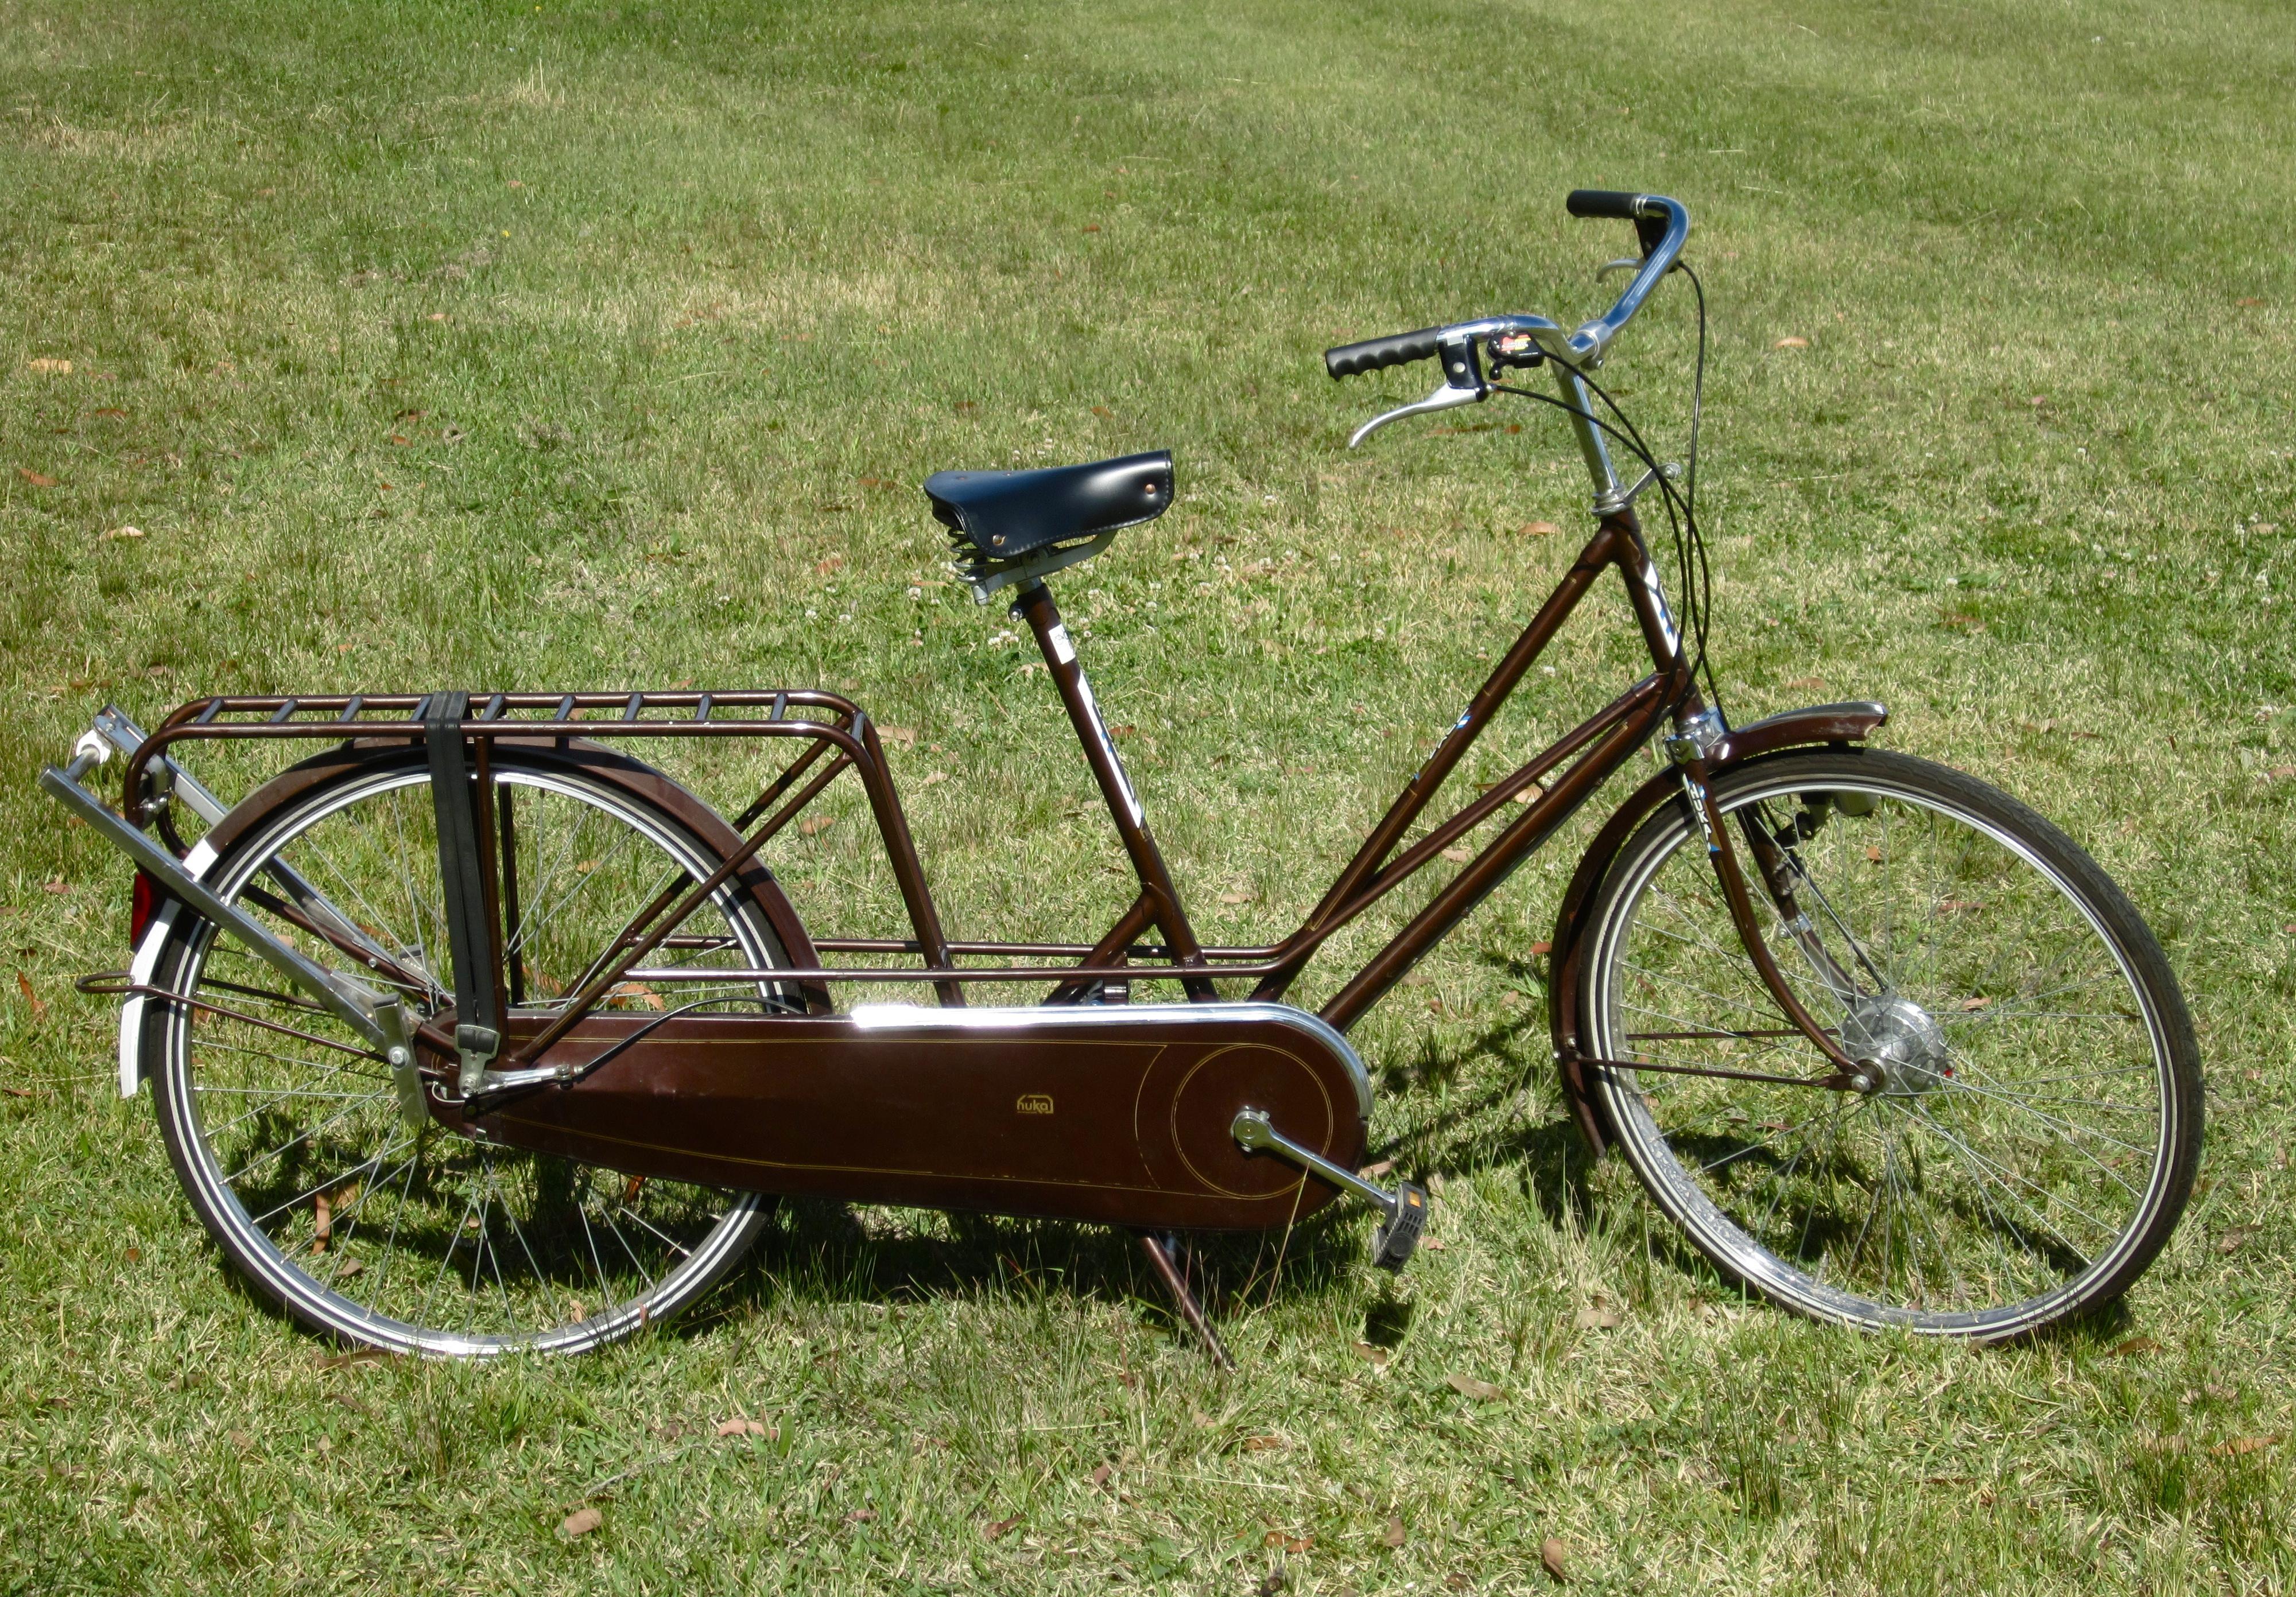 Gazelle Cabby A New Recyclist